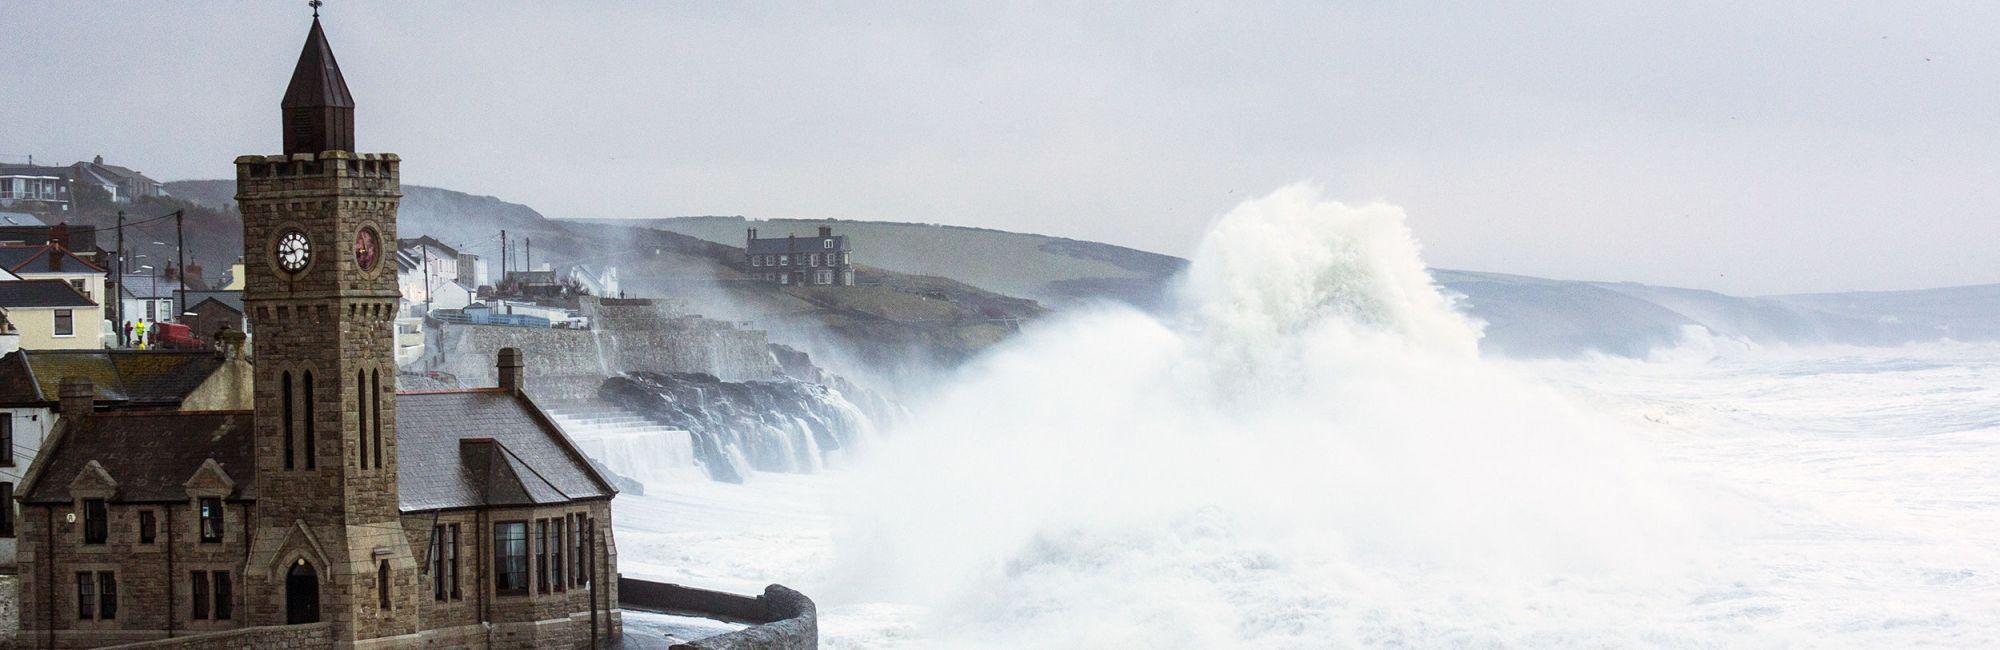 Porthleven storm